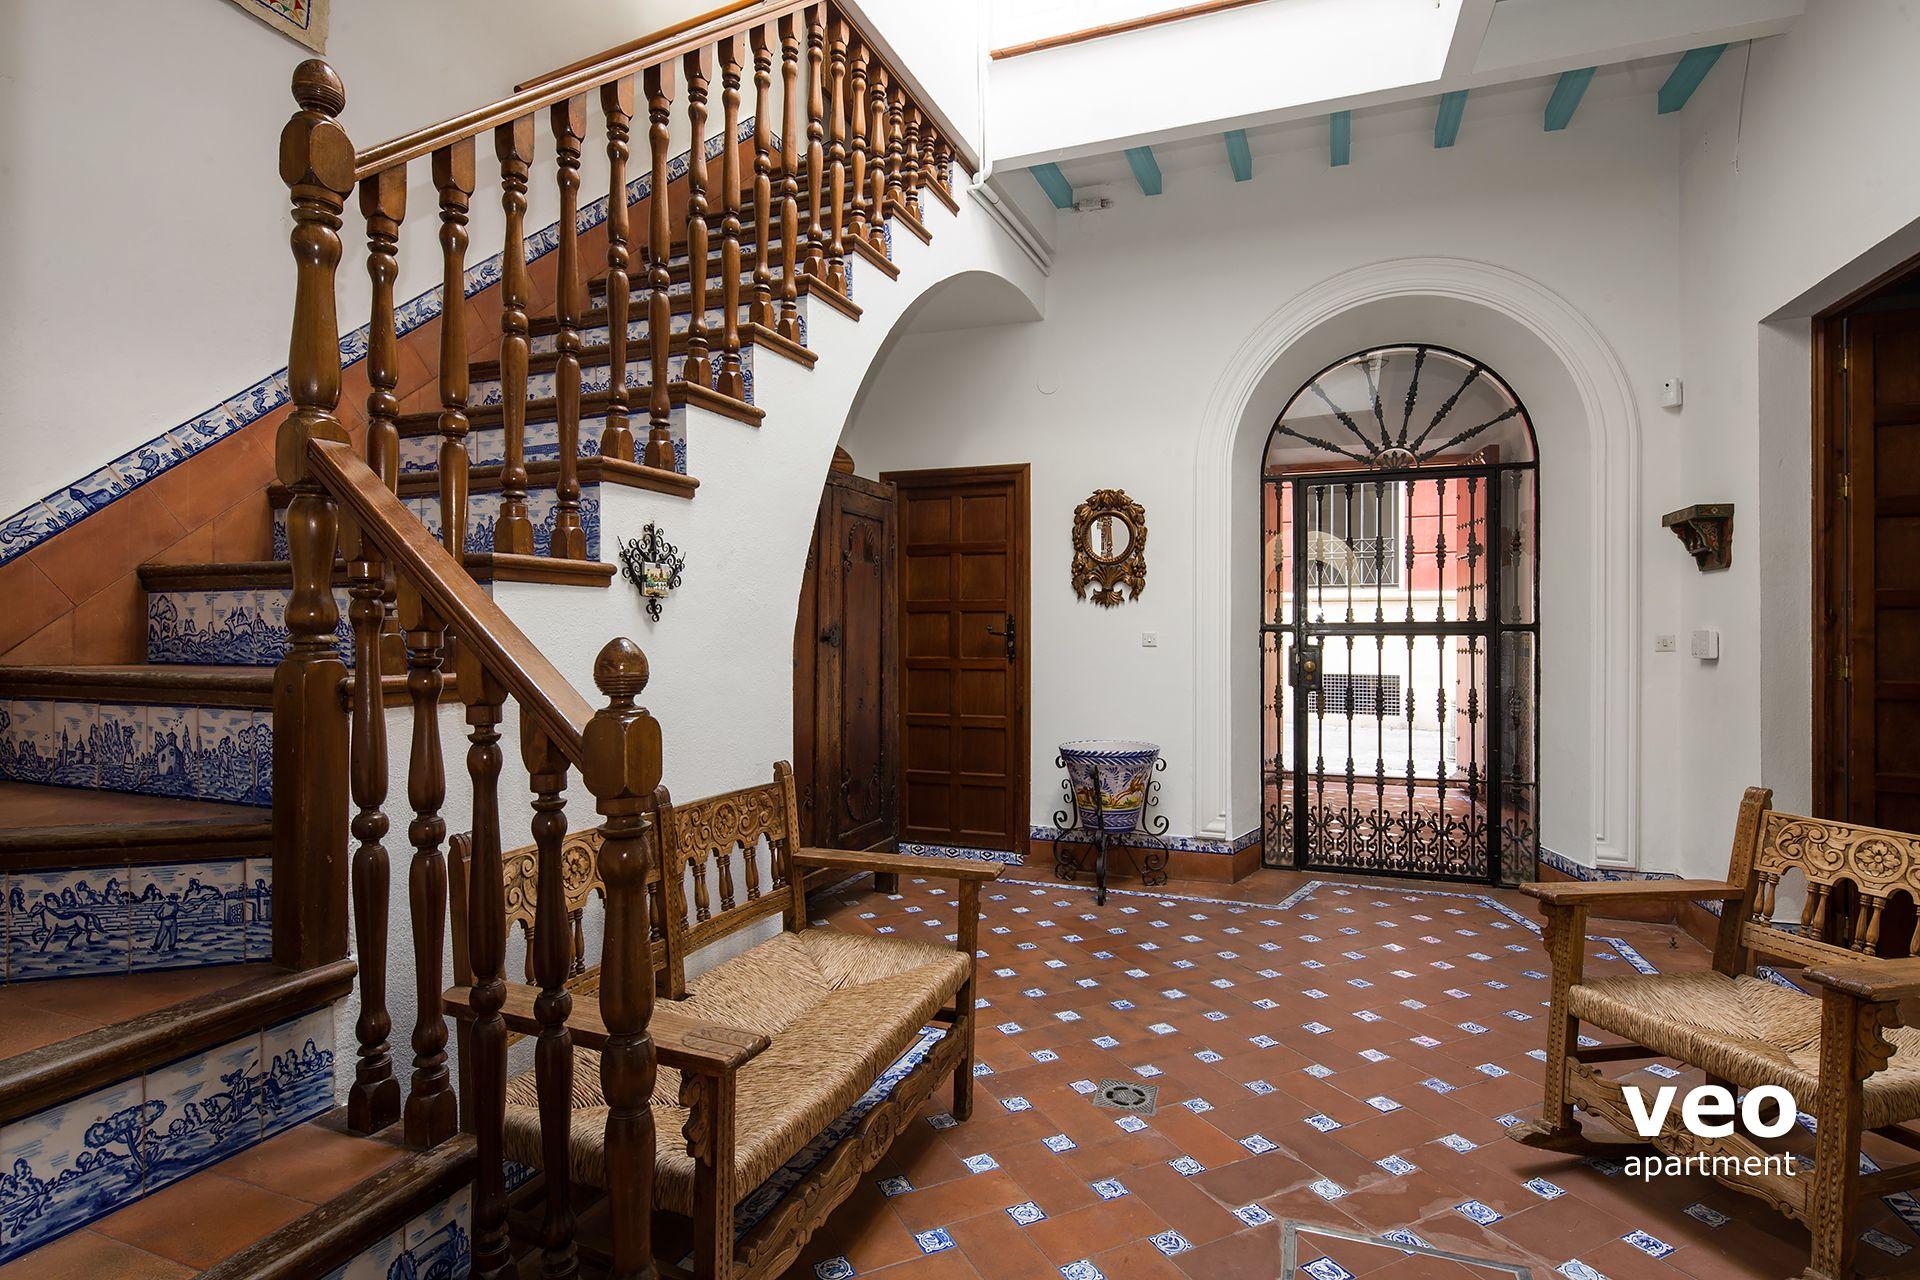 Appartement Rue Lirio S 233 Ville Espagne Casa Lirio